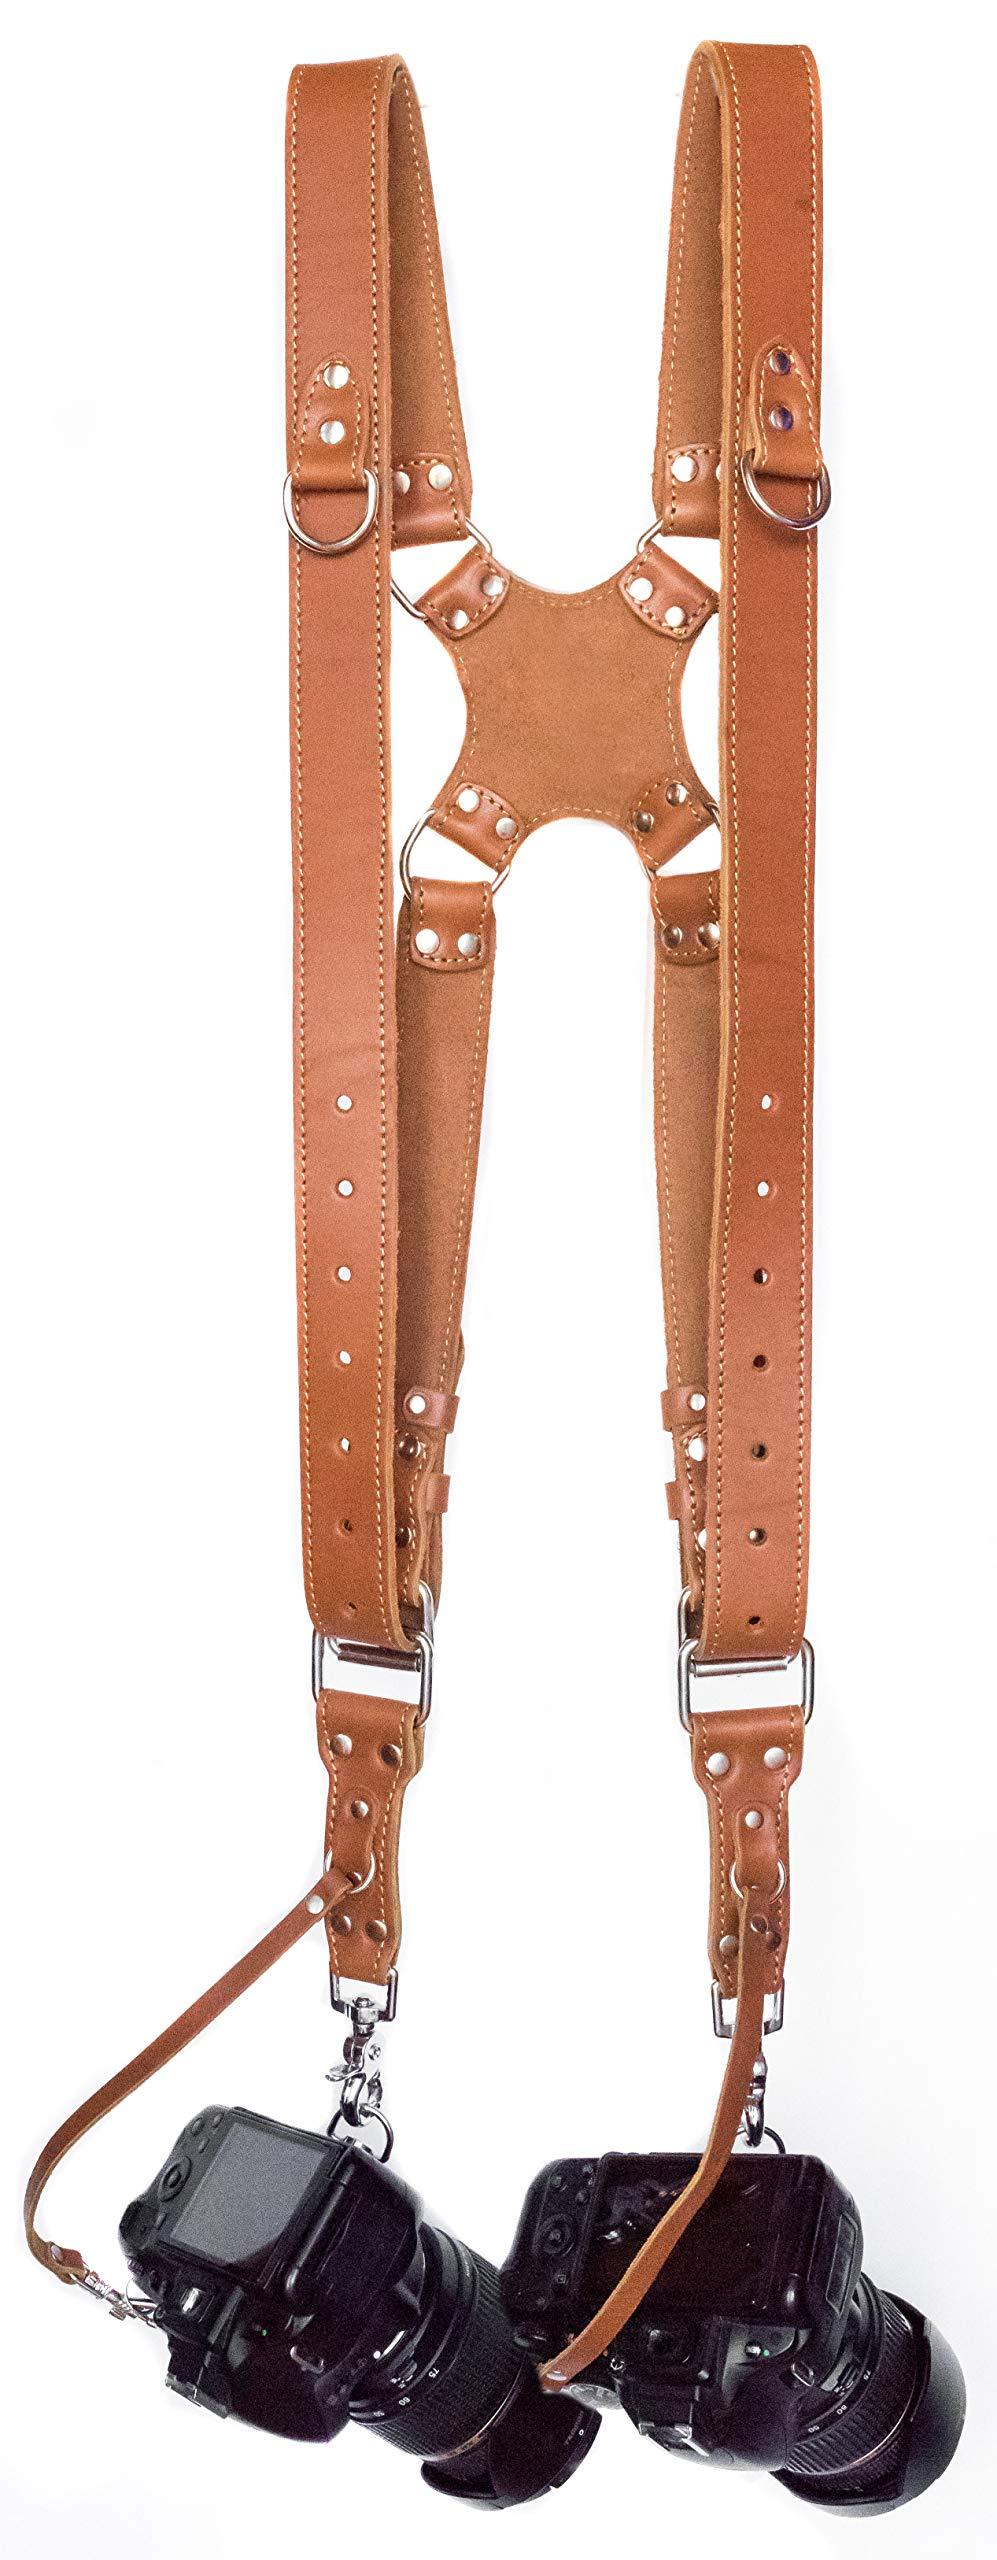 Camera Strap Accessories for Two-Cameras - Dual Shoulder Leather Harness - Multi Camera Gear for DSLR/SLROrange